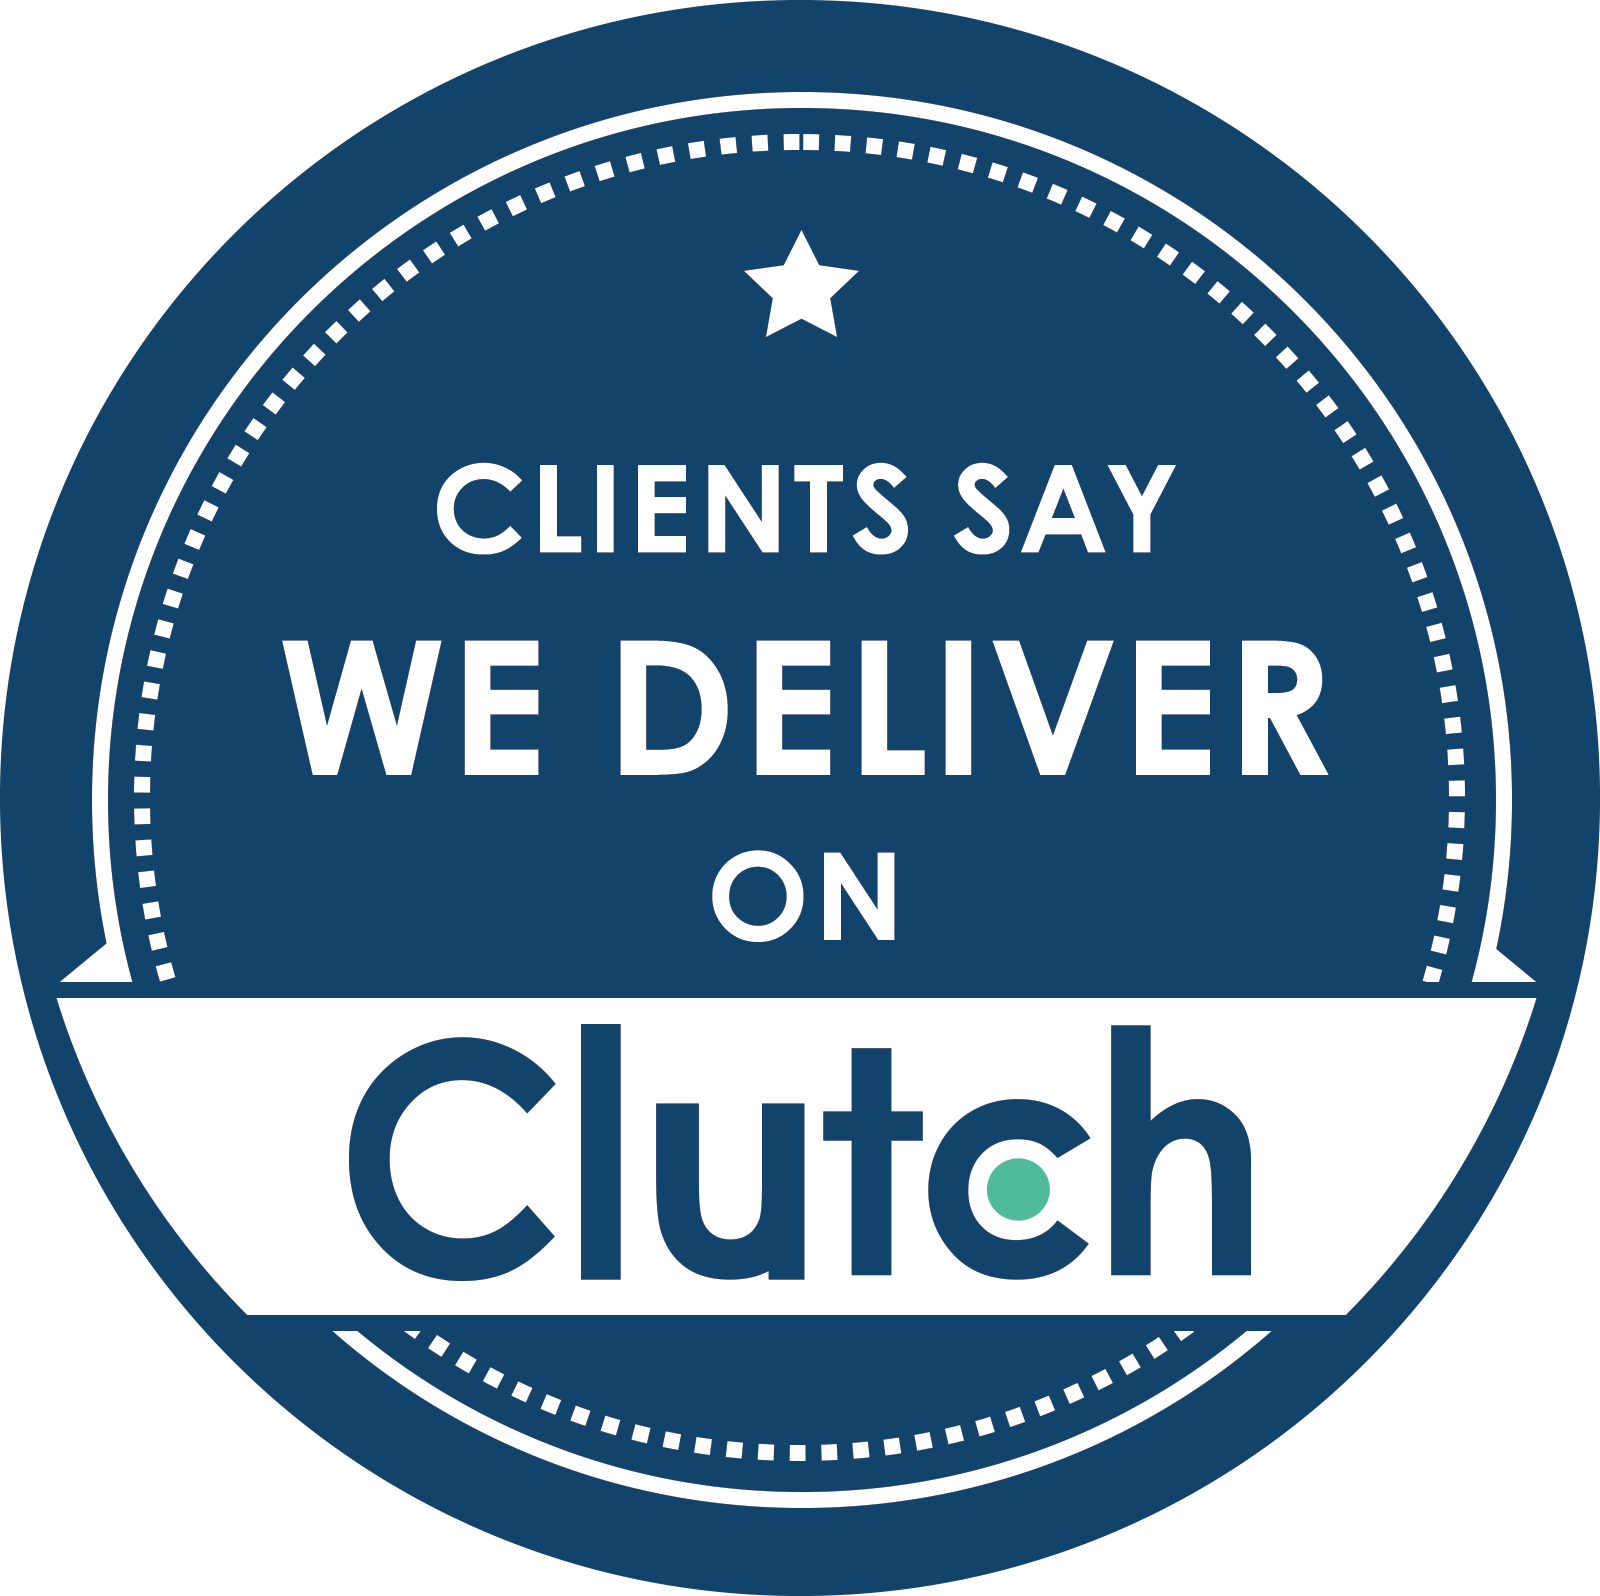 clutch-we-deliver.png